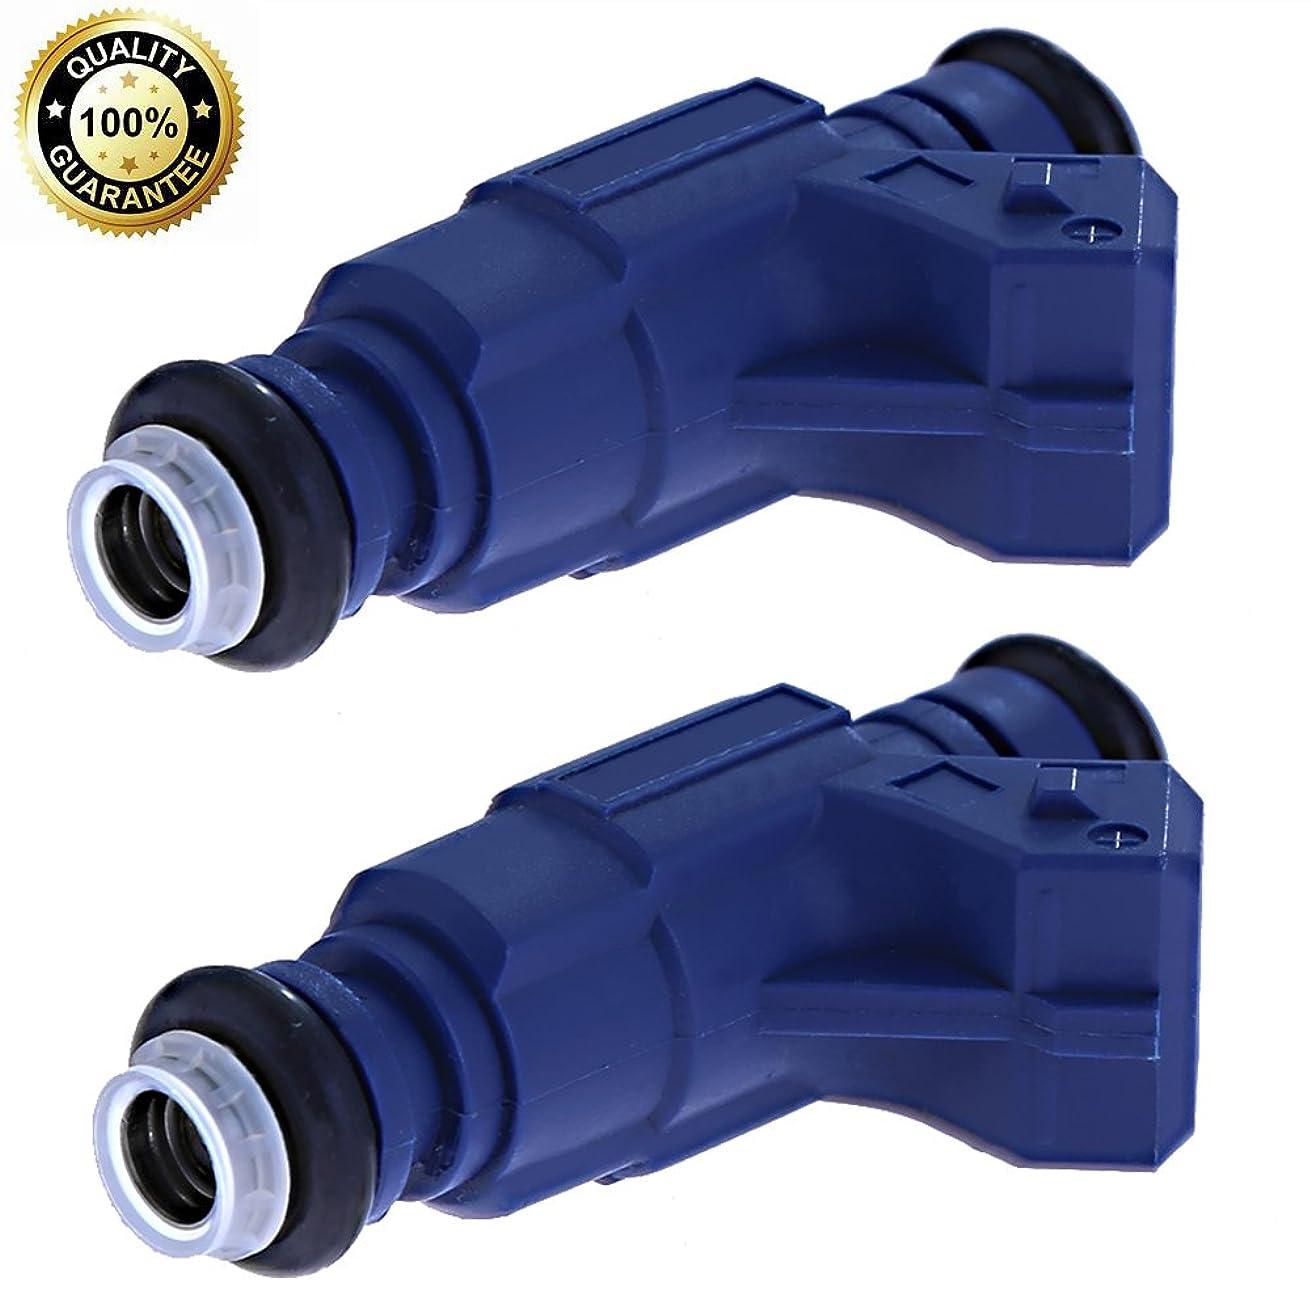 Fuel Injector 0280156208 for Polaris RZR Sportsman Ranger EFI 700 800(pack of 2)